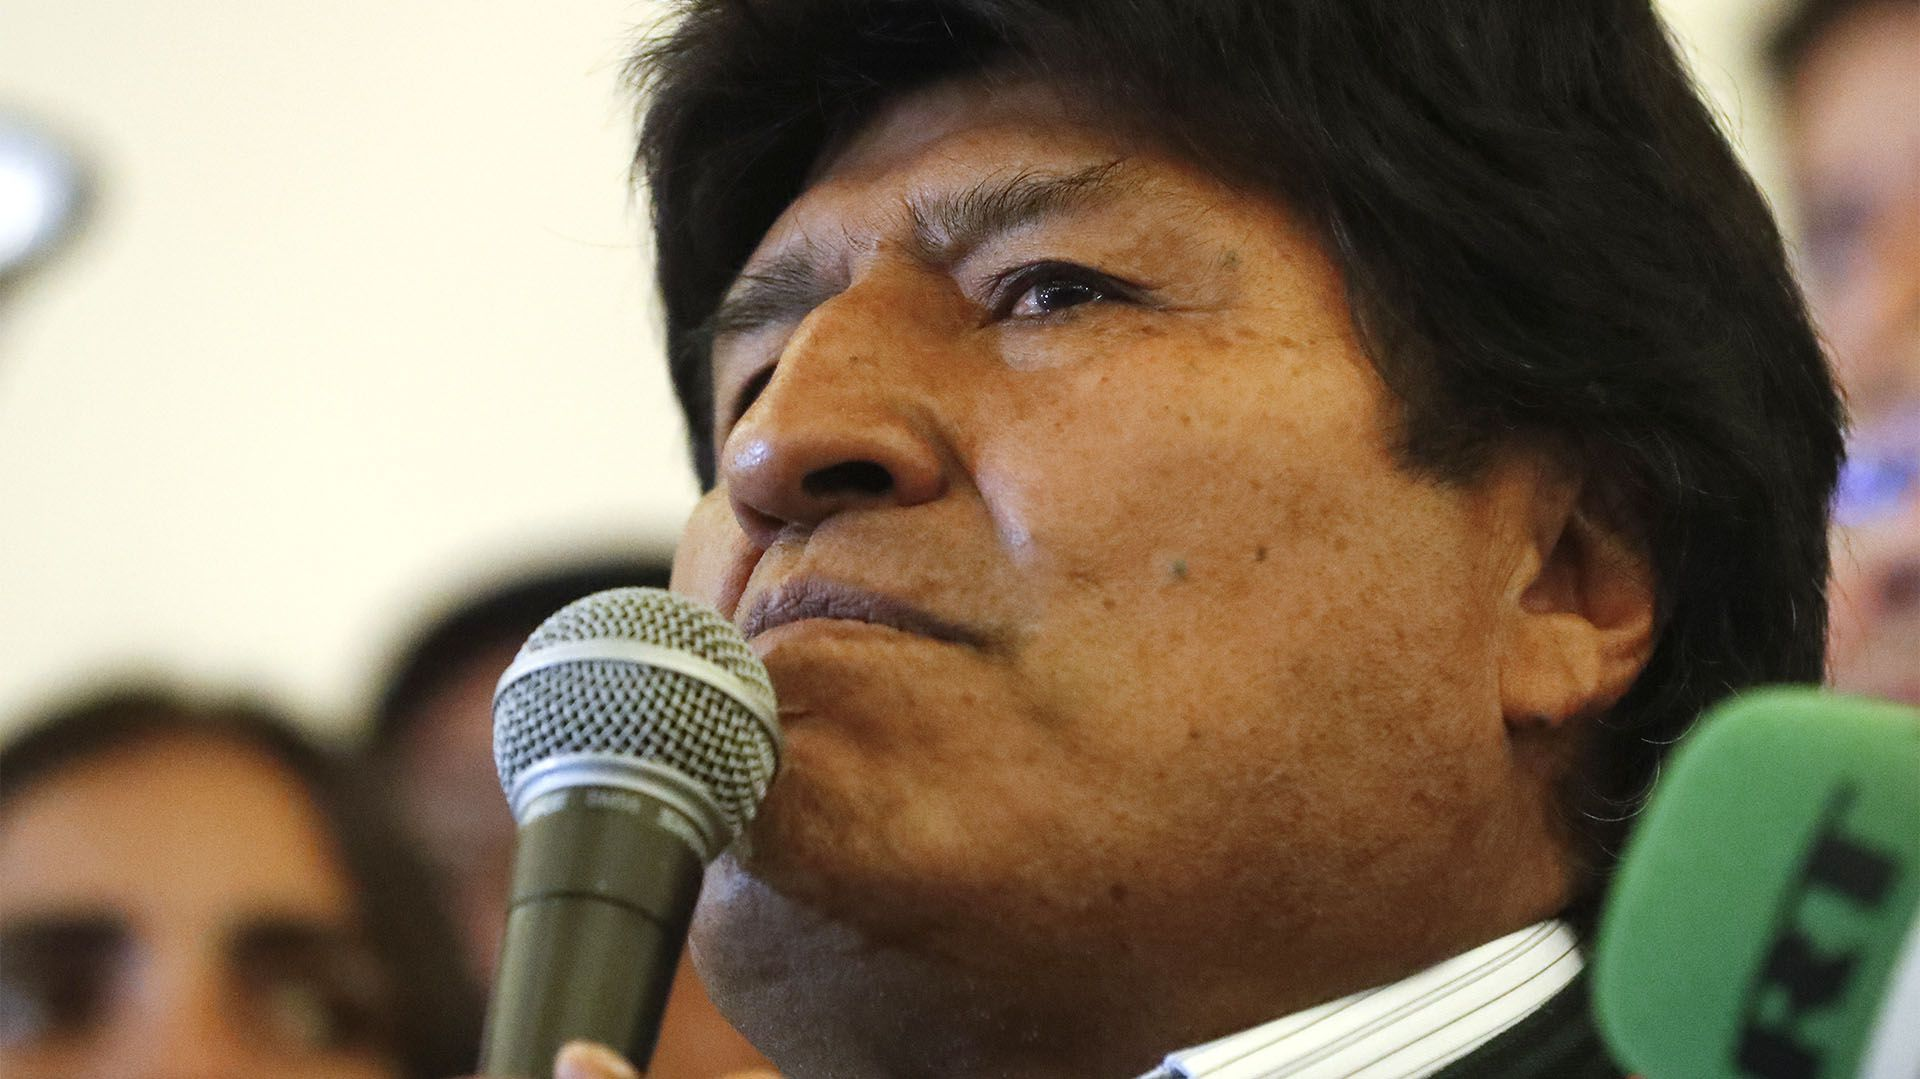 Pese a no contar con el escrutinio final, Evo Morales había adelantado que ganaría en primera vuelta (AP Photo/Jorge Saenz)